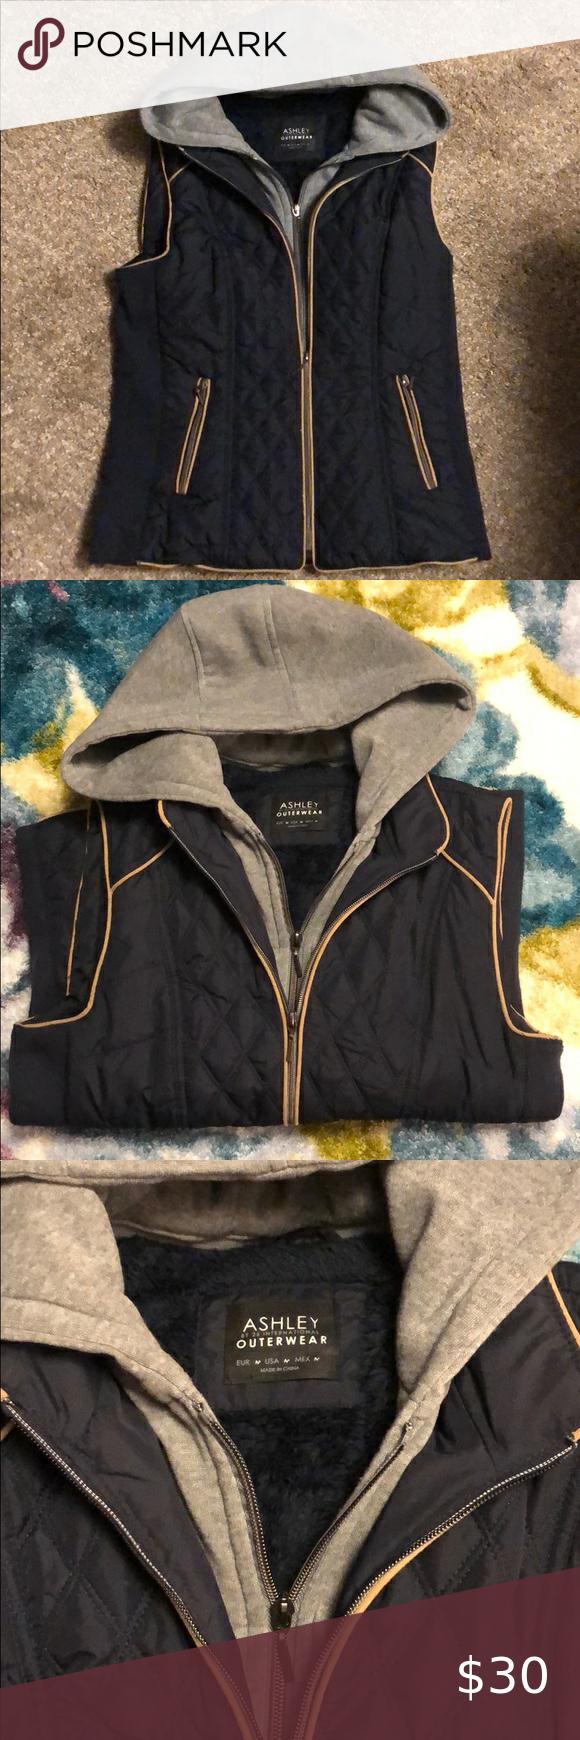 Ashley Outerwear By 26 International Vest Hooded Vest Outerwear Jackets For Women [ 1740 x 580 Pixel ]